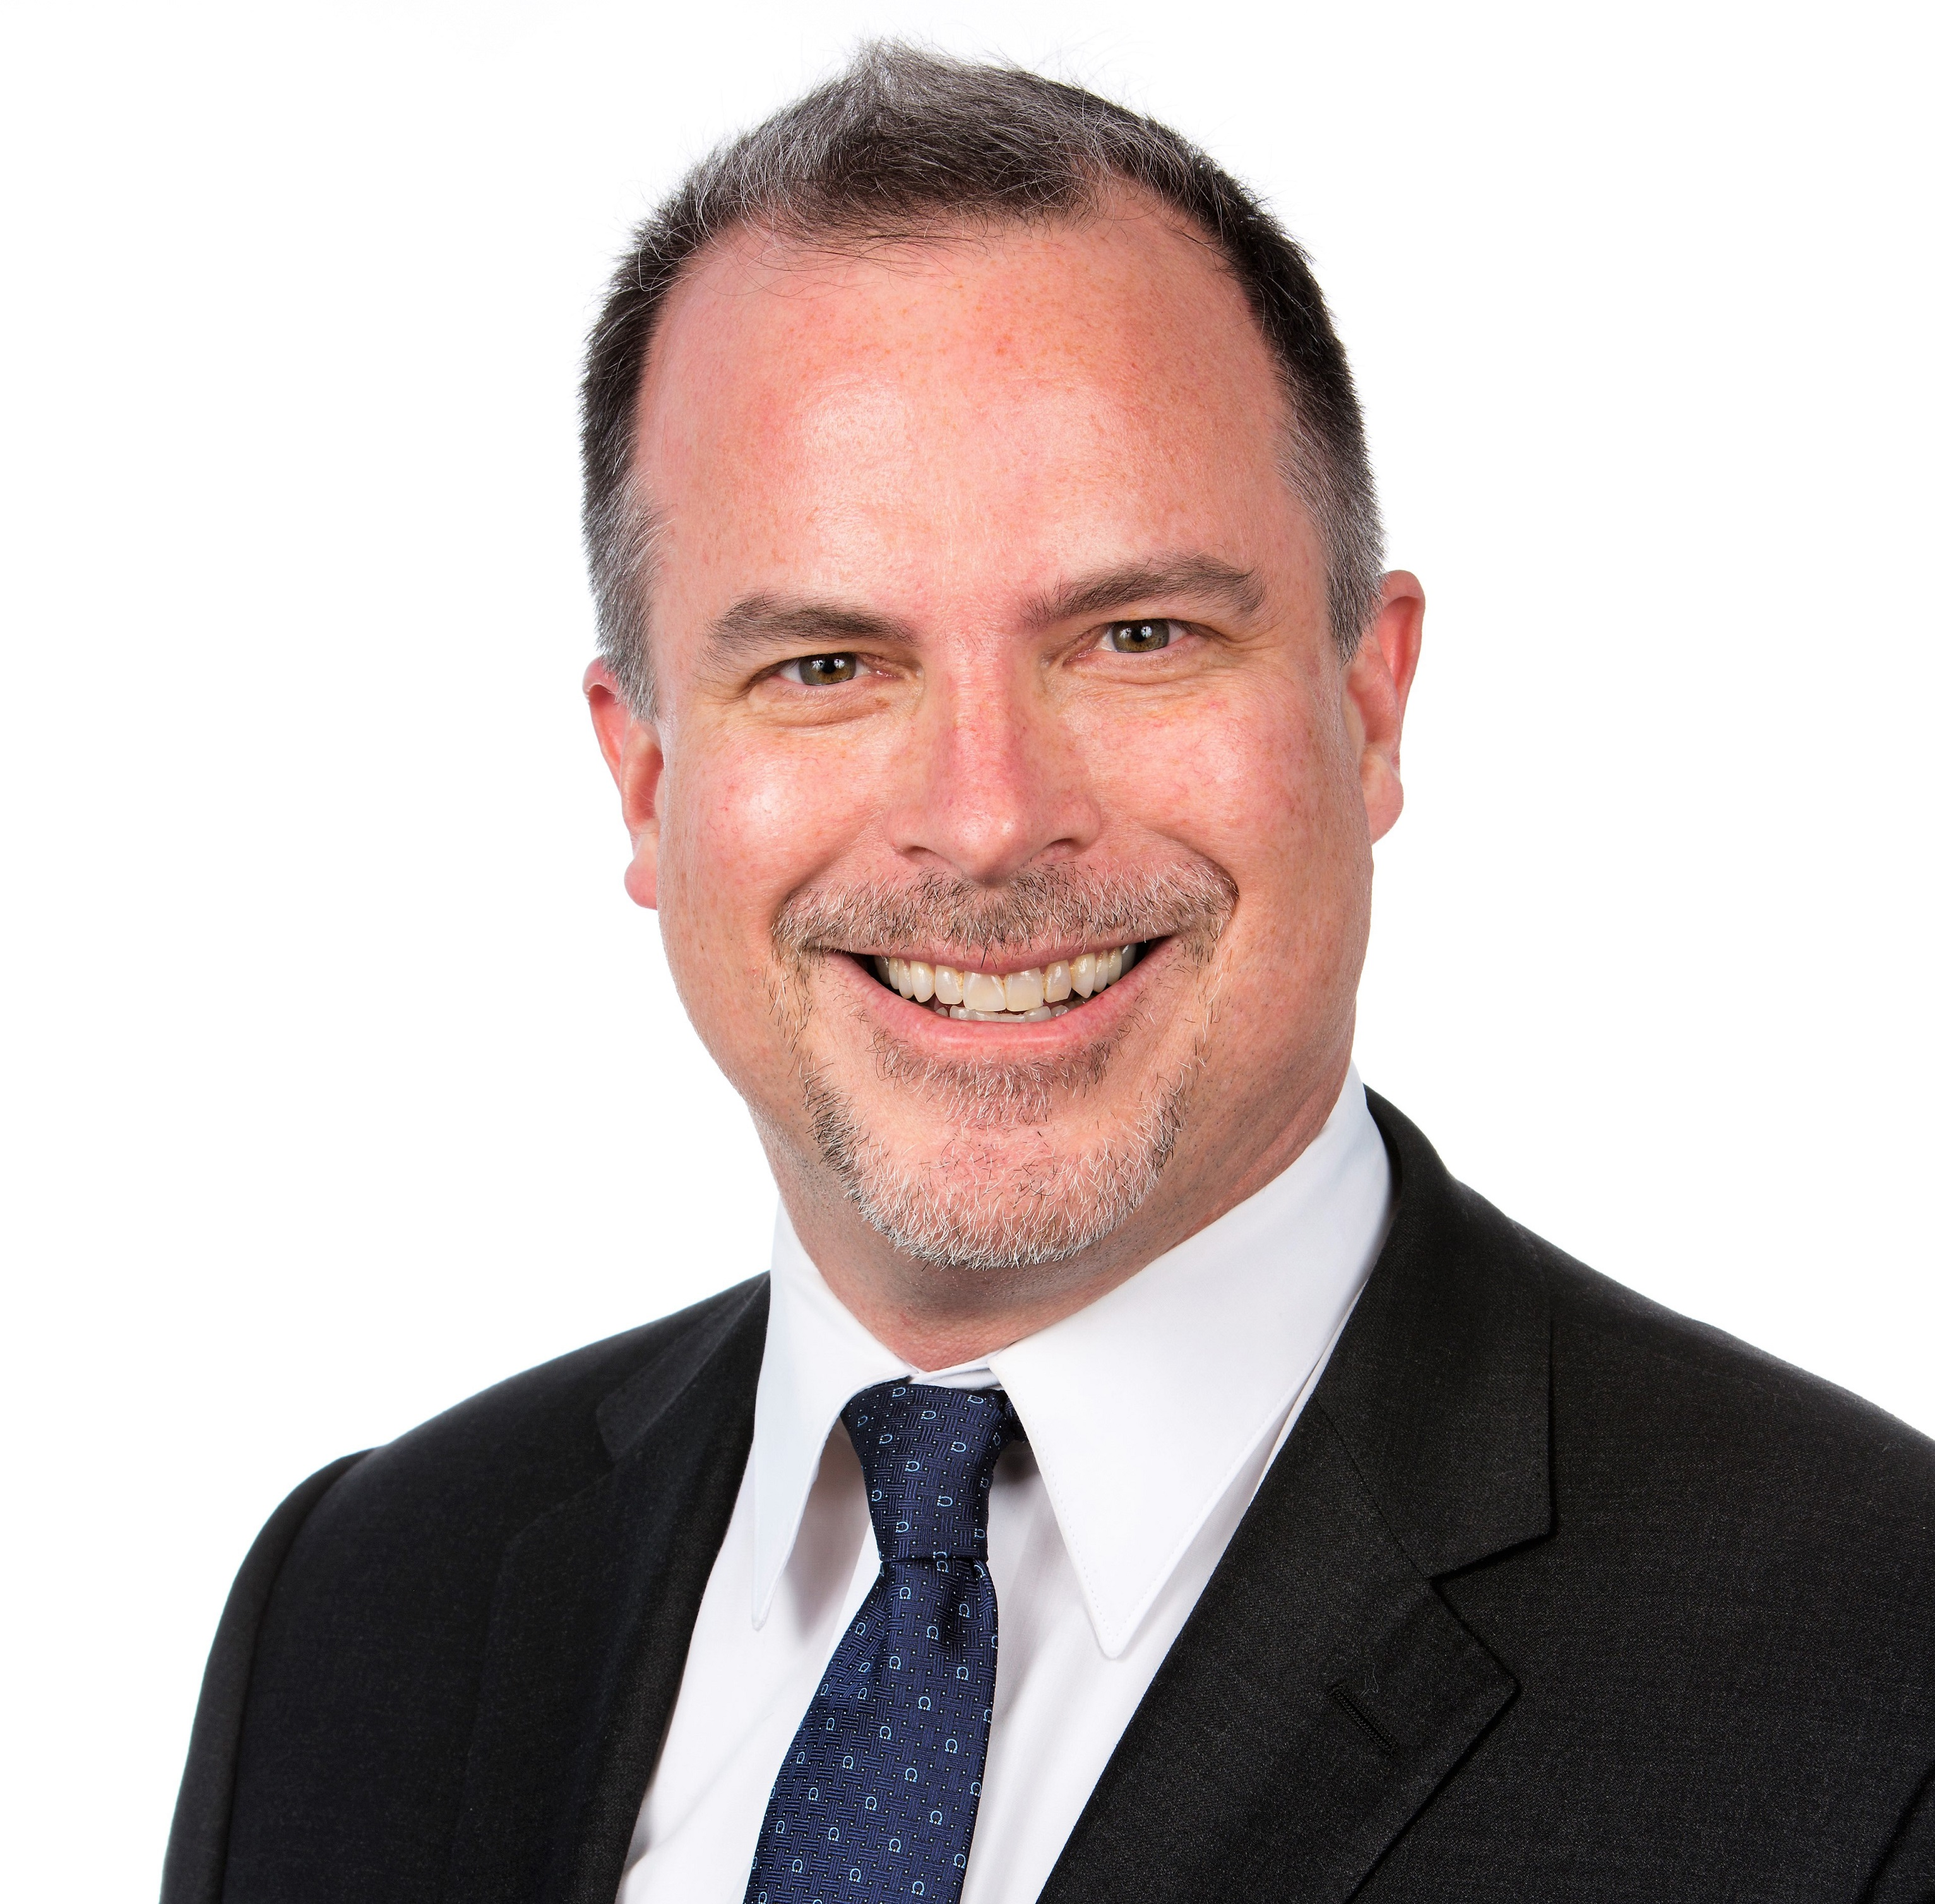 Dave Colonna